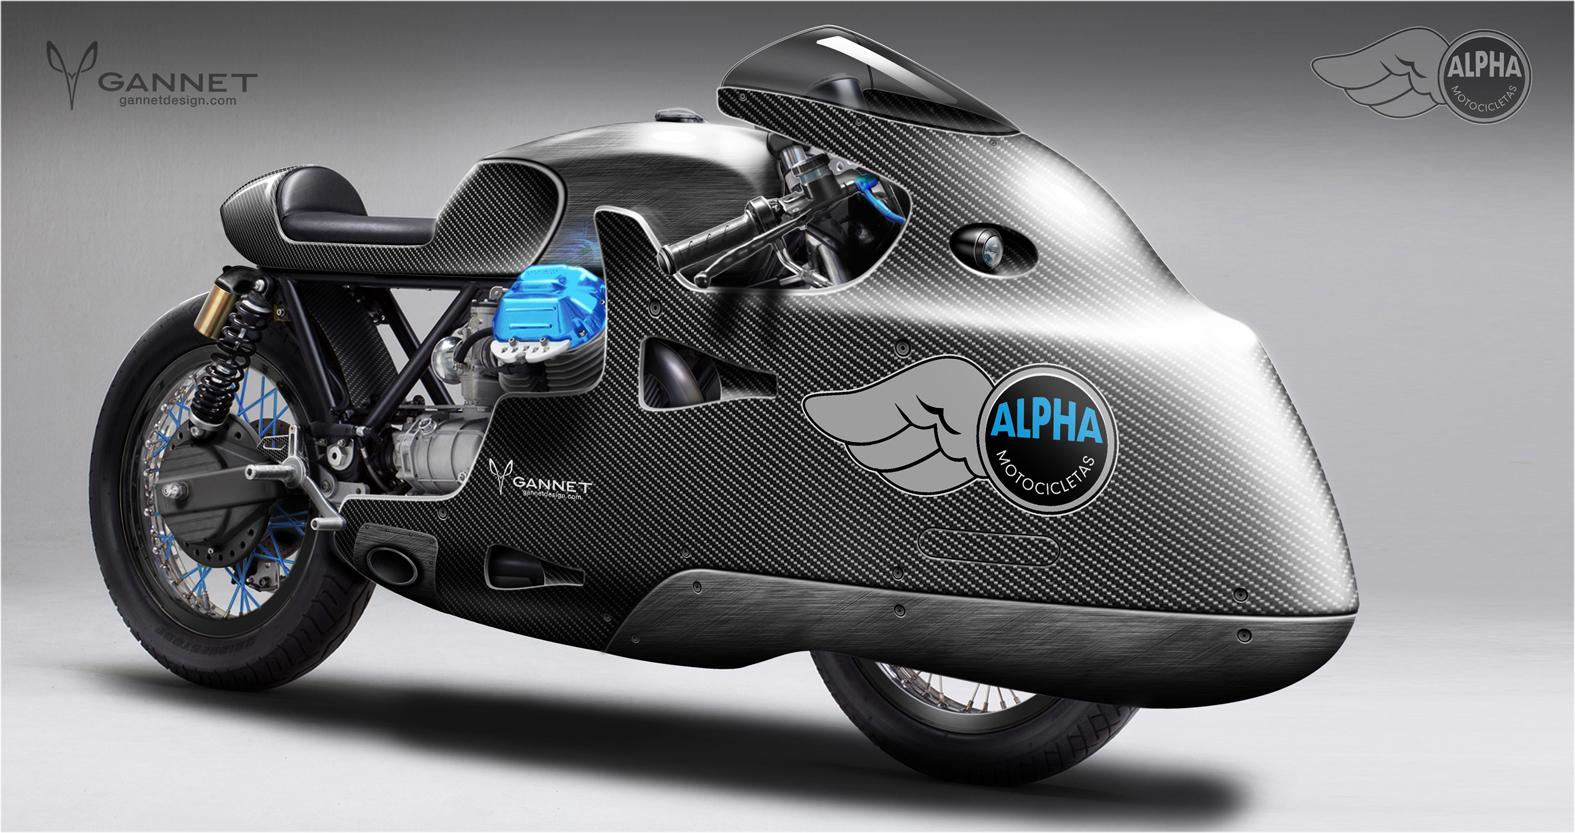 Moto Guzzi – GANNET Design